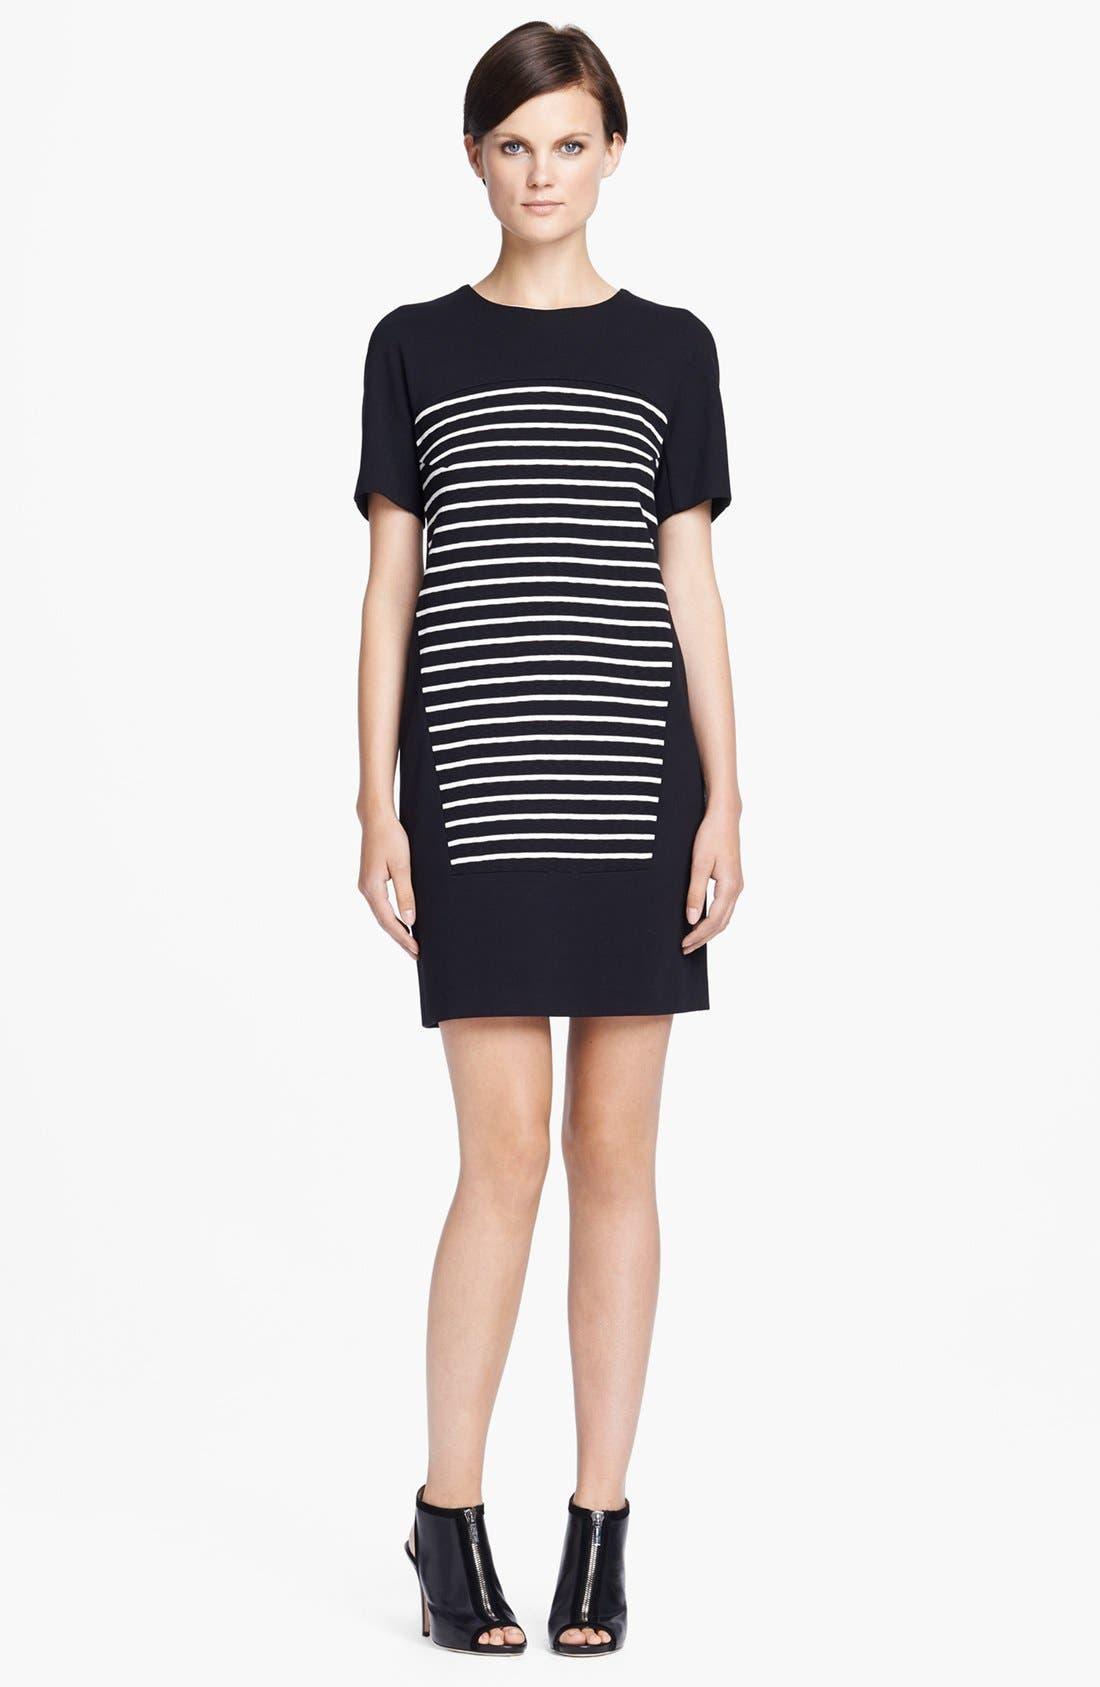 Alternate Image 1 Selected - Mcginn 'Samantha' Stripe Dress